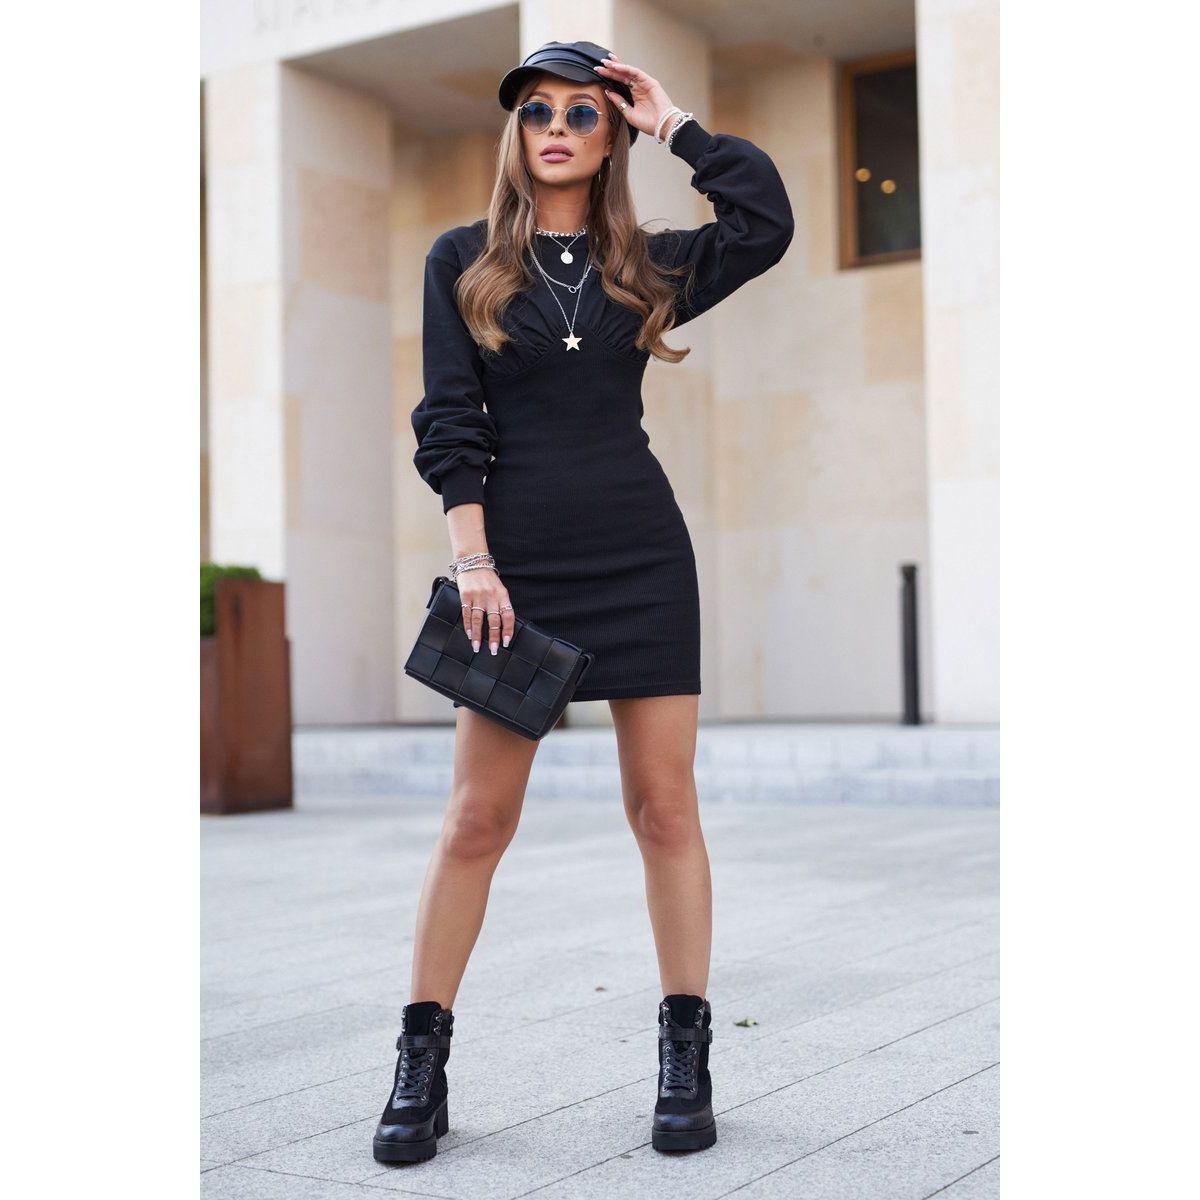 S Barski Damskie Botki Trapery Czarne Mango In 2021 Fashion Style Leather Skirt